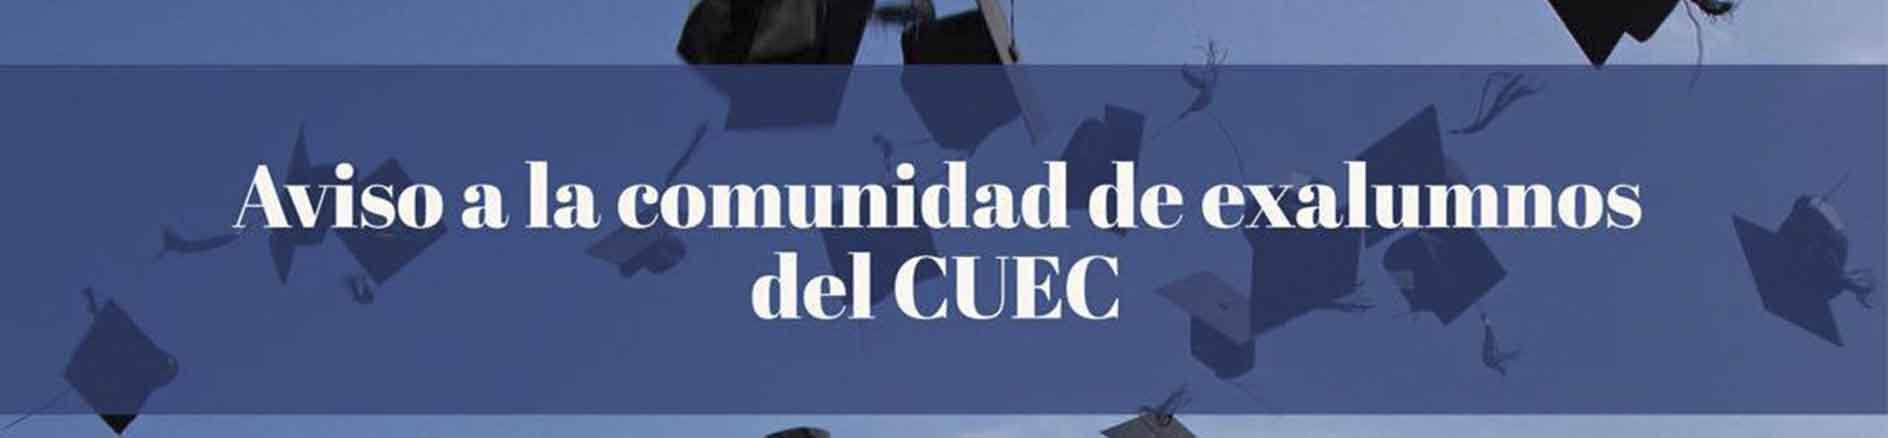 AVISO A LA COMUNIDAD DE EXALUMNOS DEL CUEC